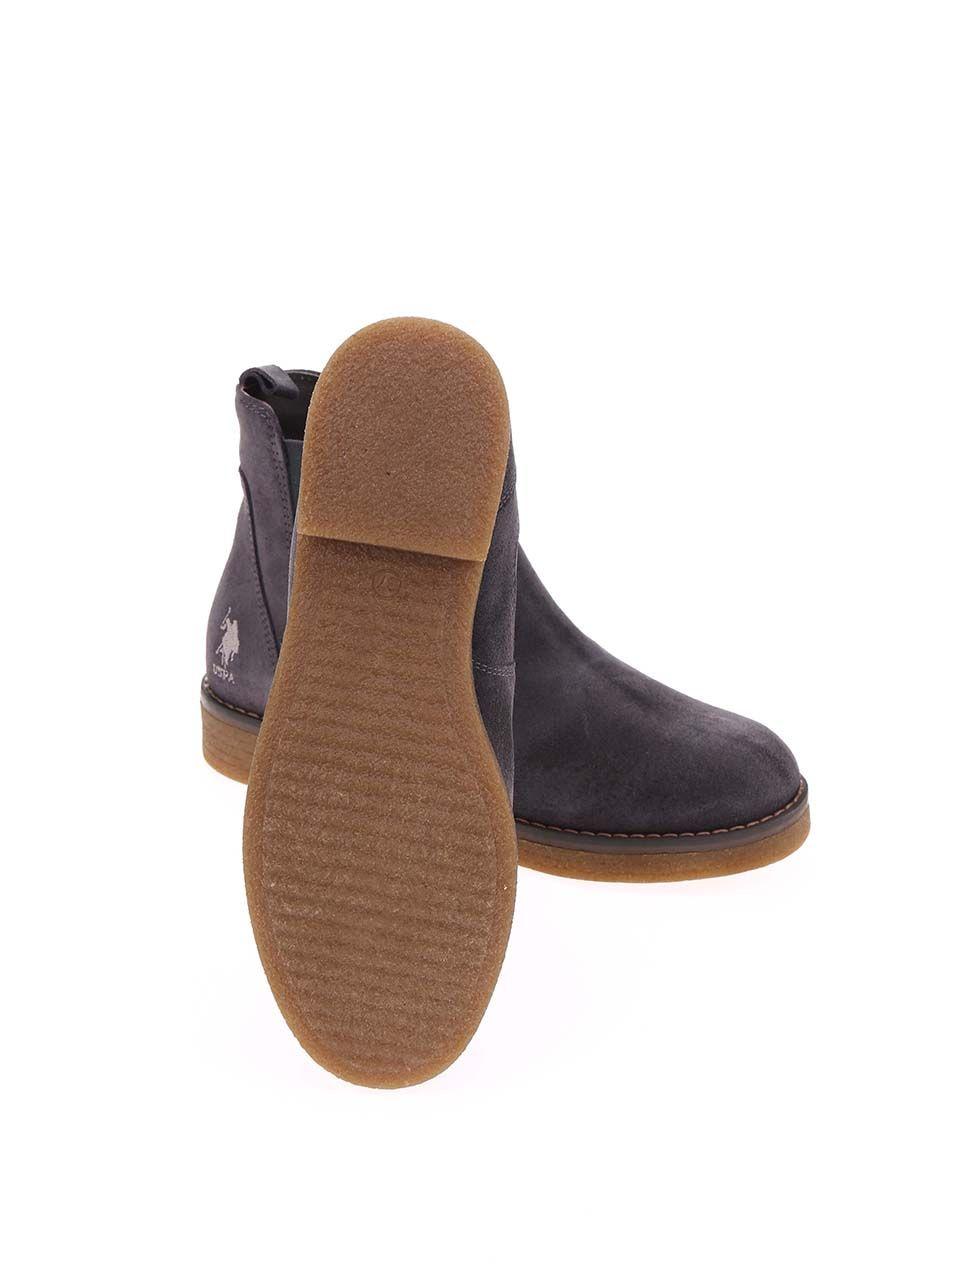 dcb07220532c Sivé dámske kožené topánky U.S. Polo Assn. Margot